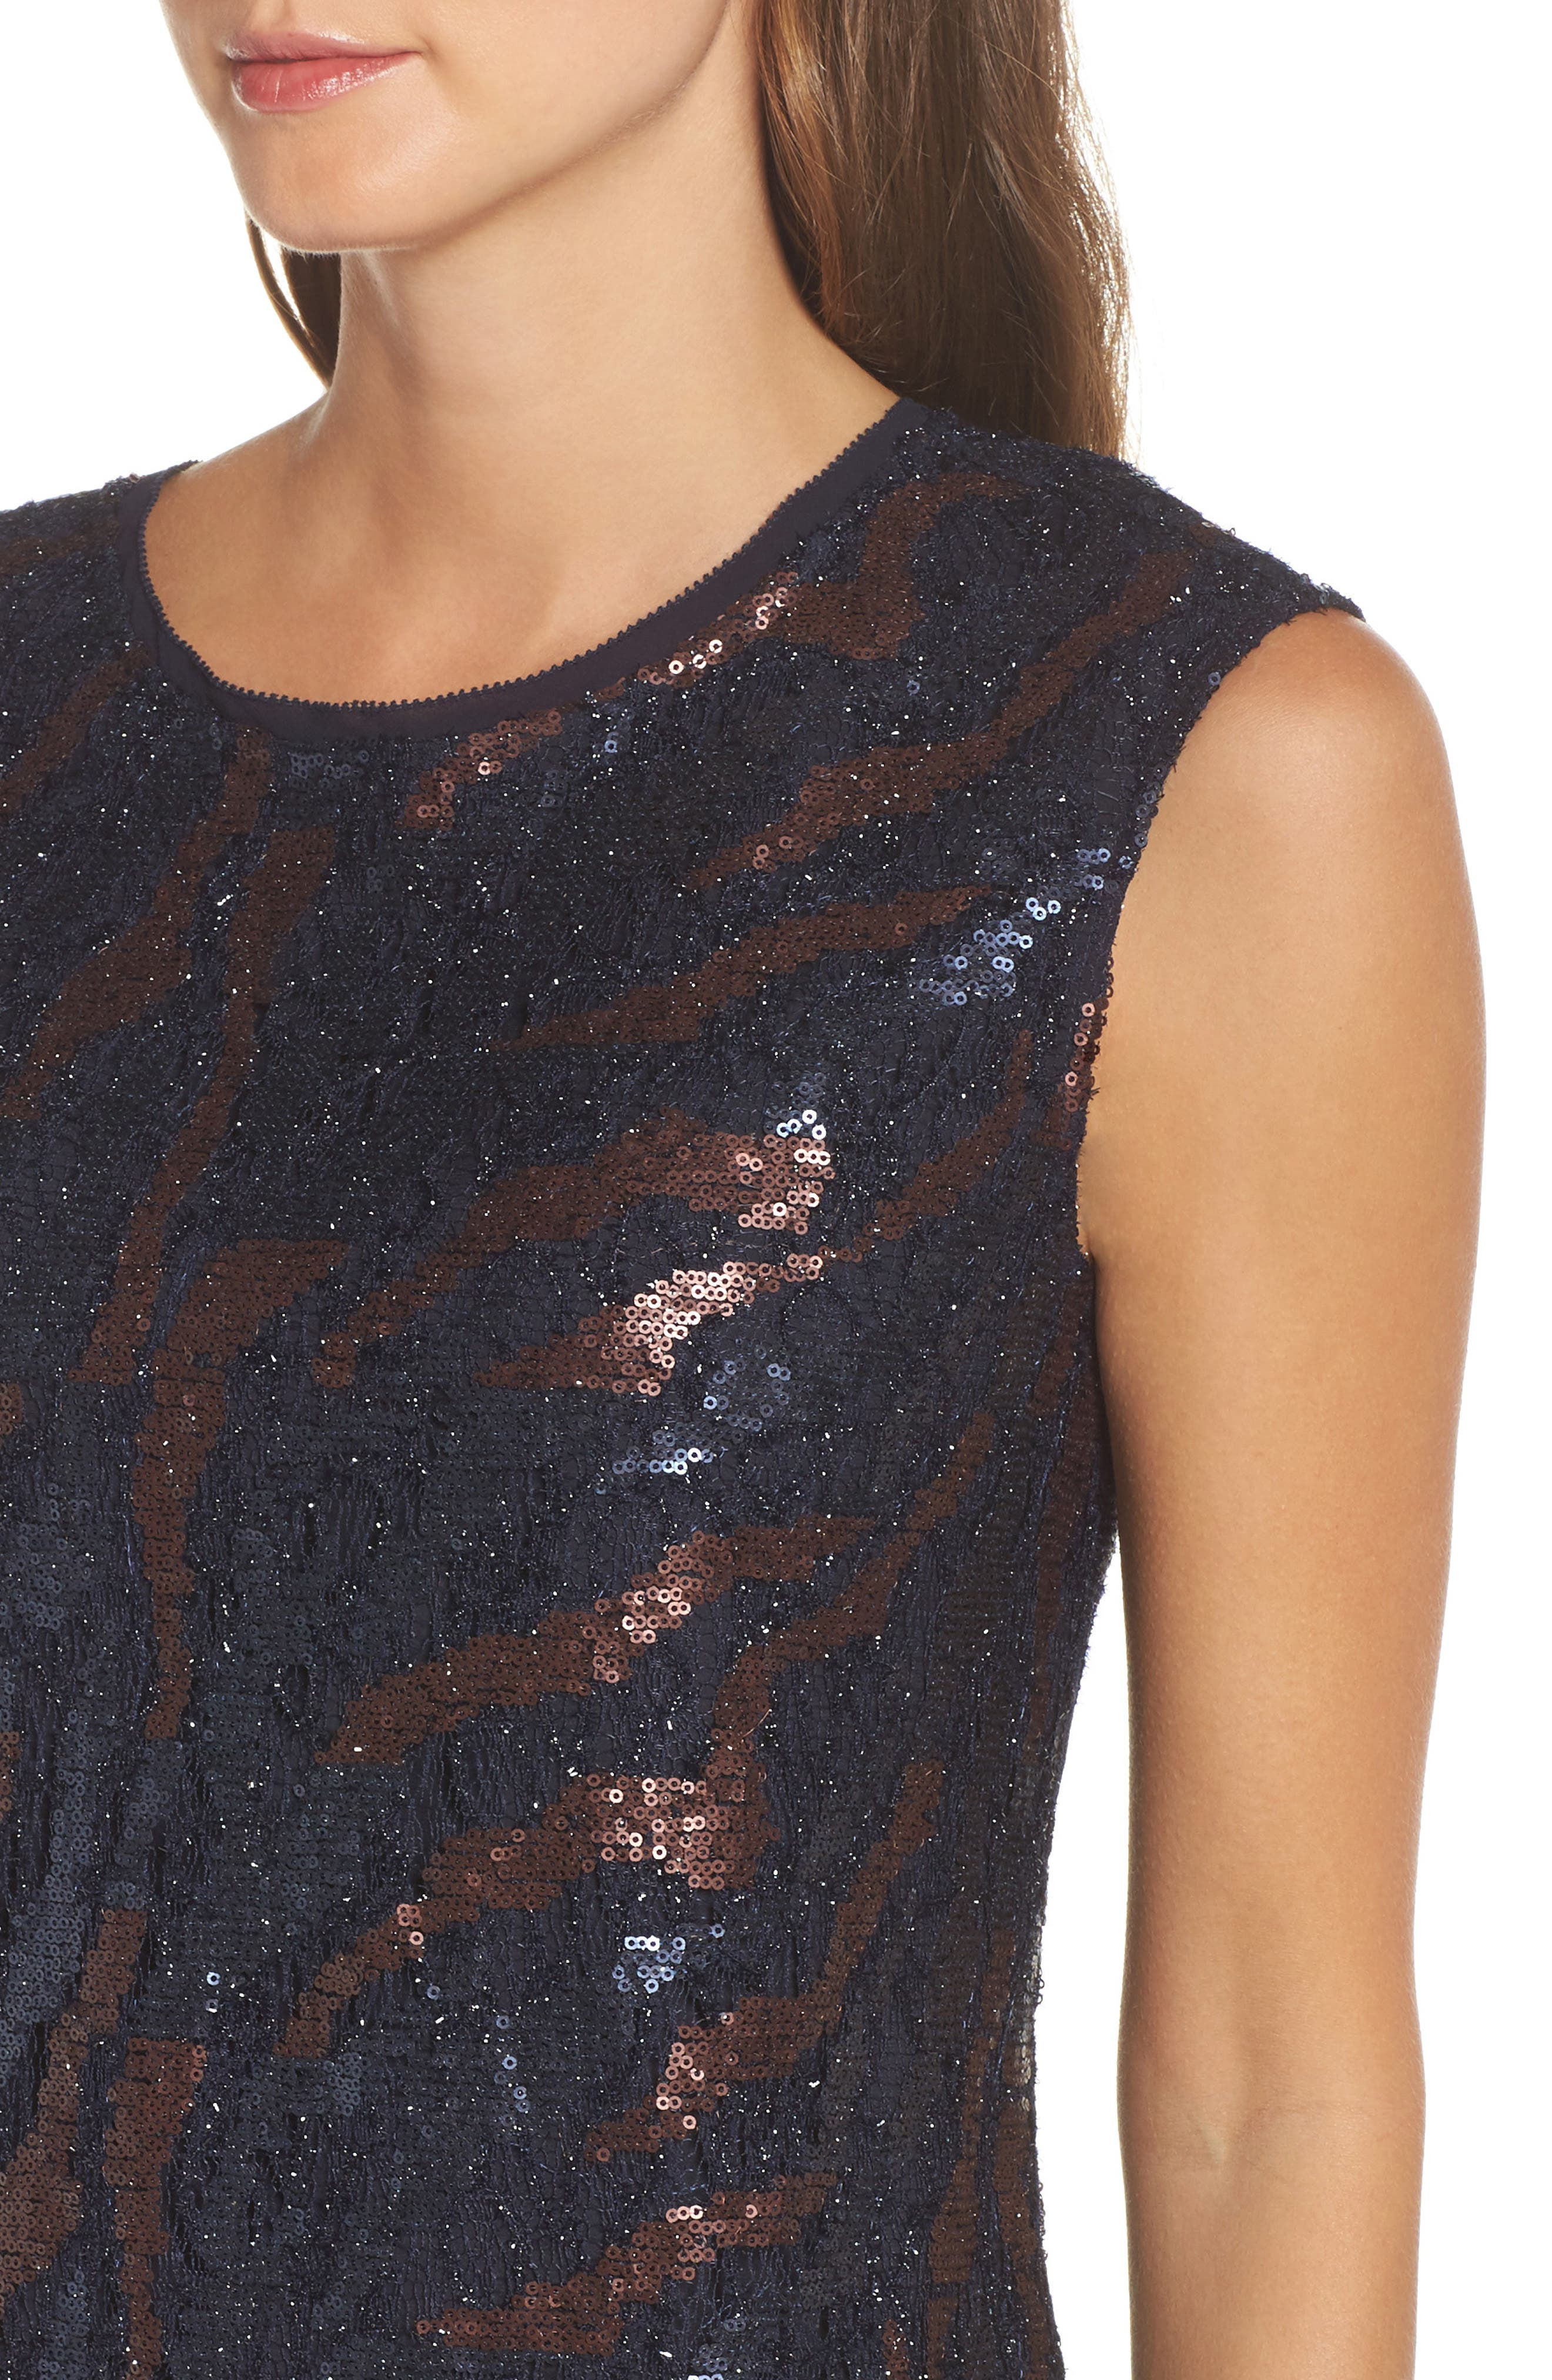 NIC + Zoe Sequin Lace Shift Dress,                             Alternate thumbnail 4, color,                             229